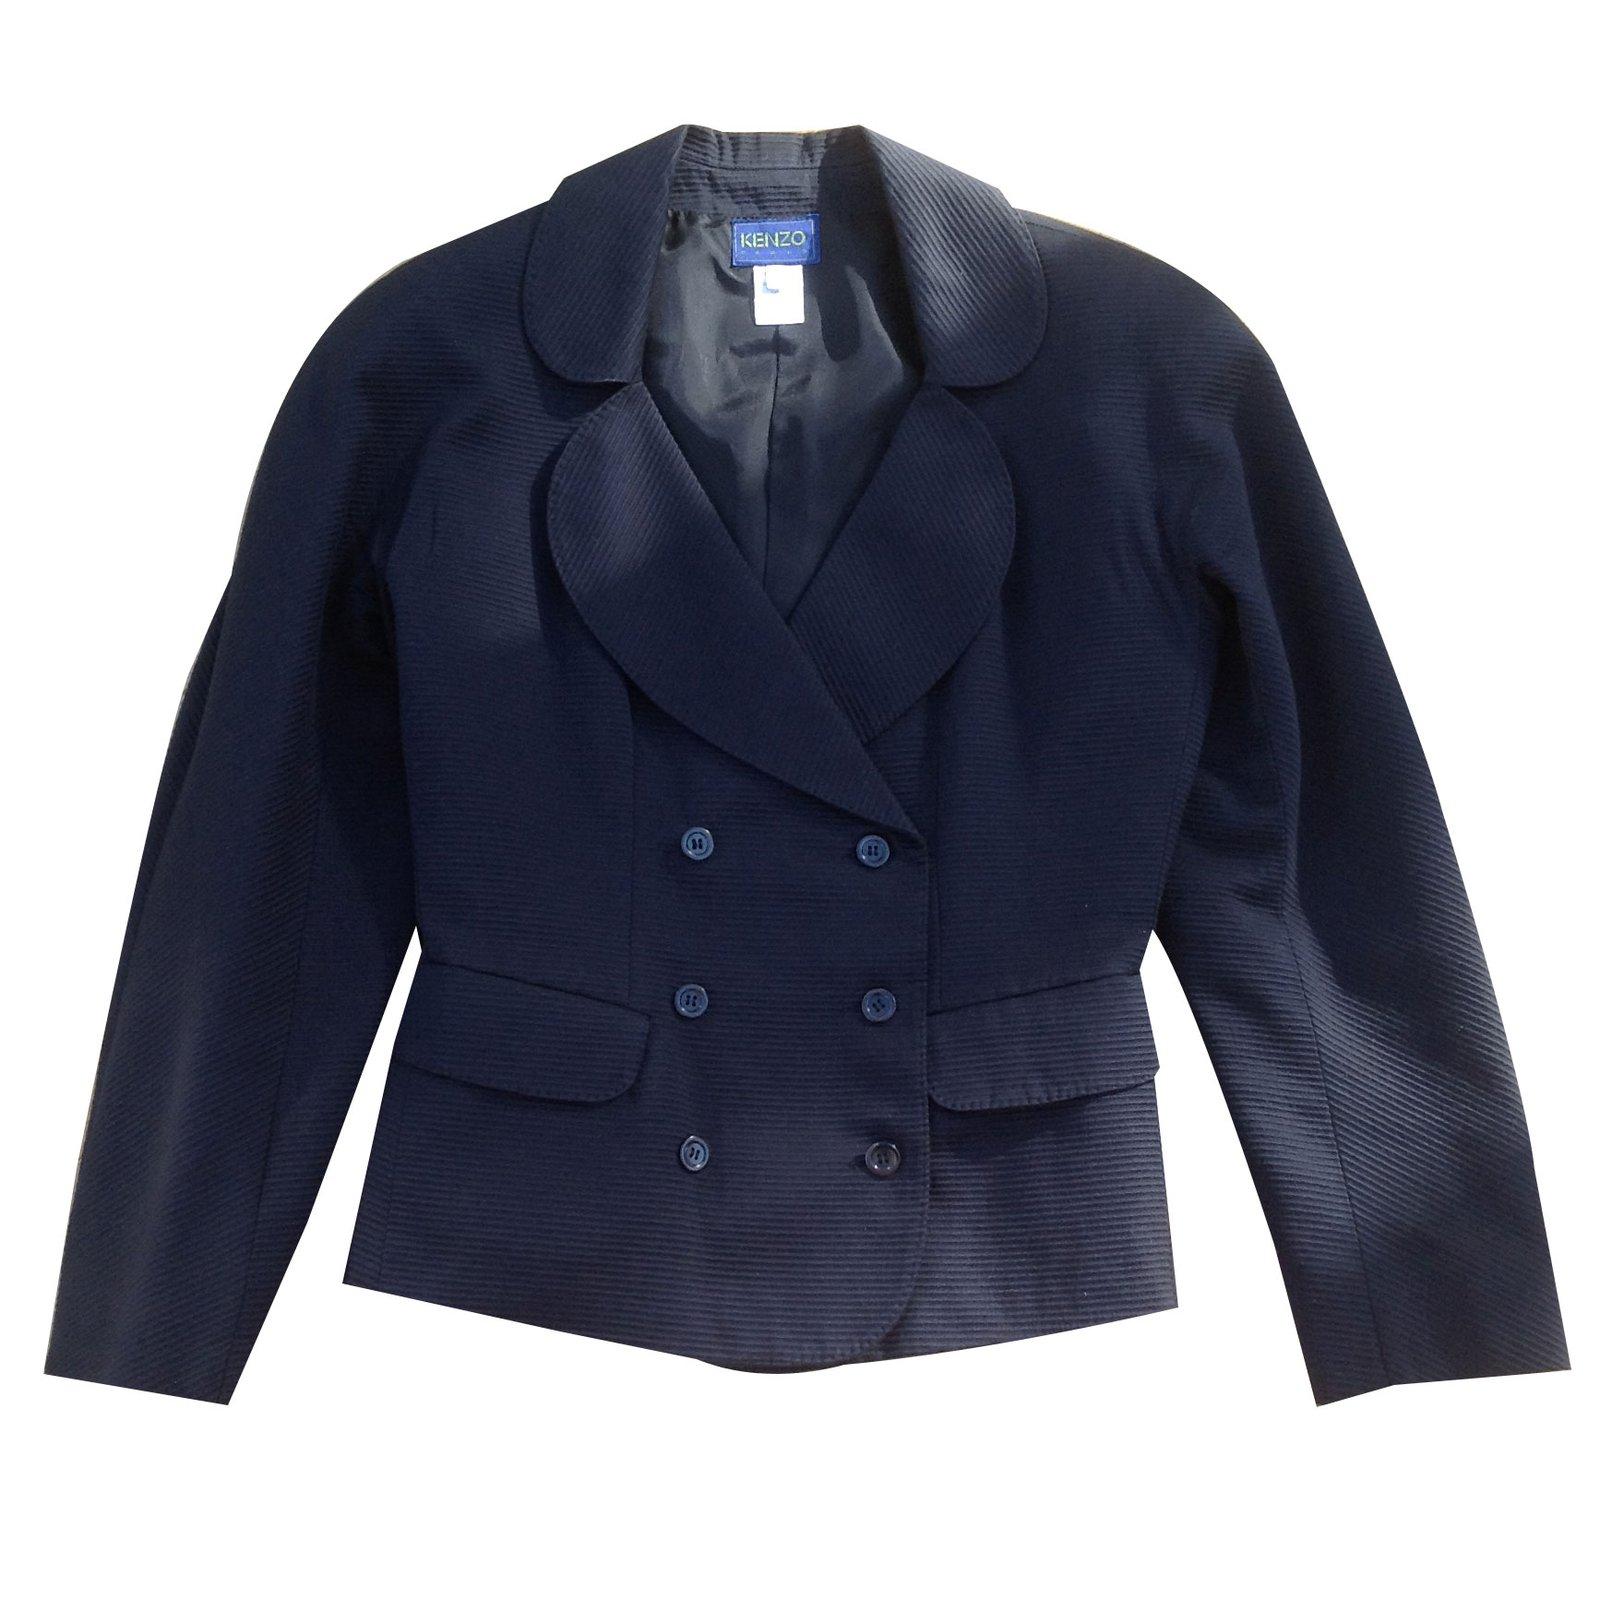 vestes kenzo vestes coton autre joli closet. Black Bedroom Furniture Sets. Home Design Ideas